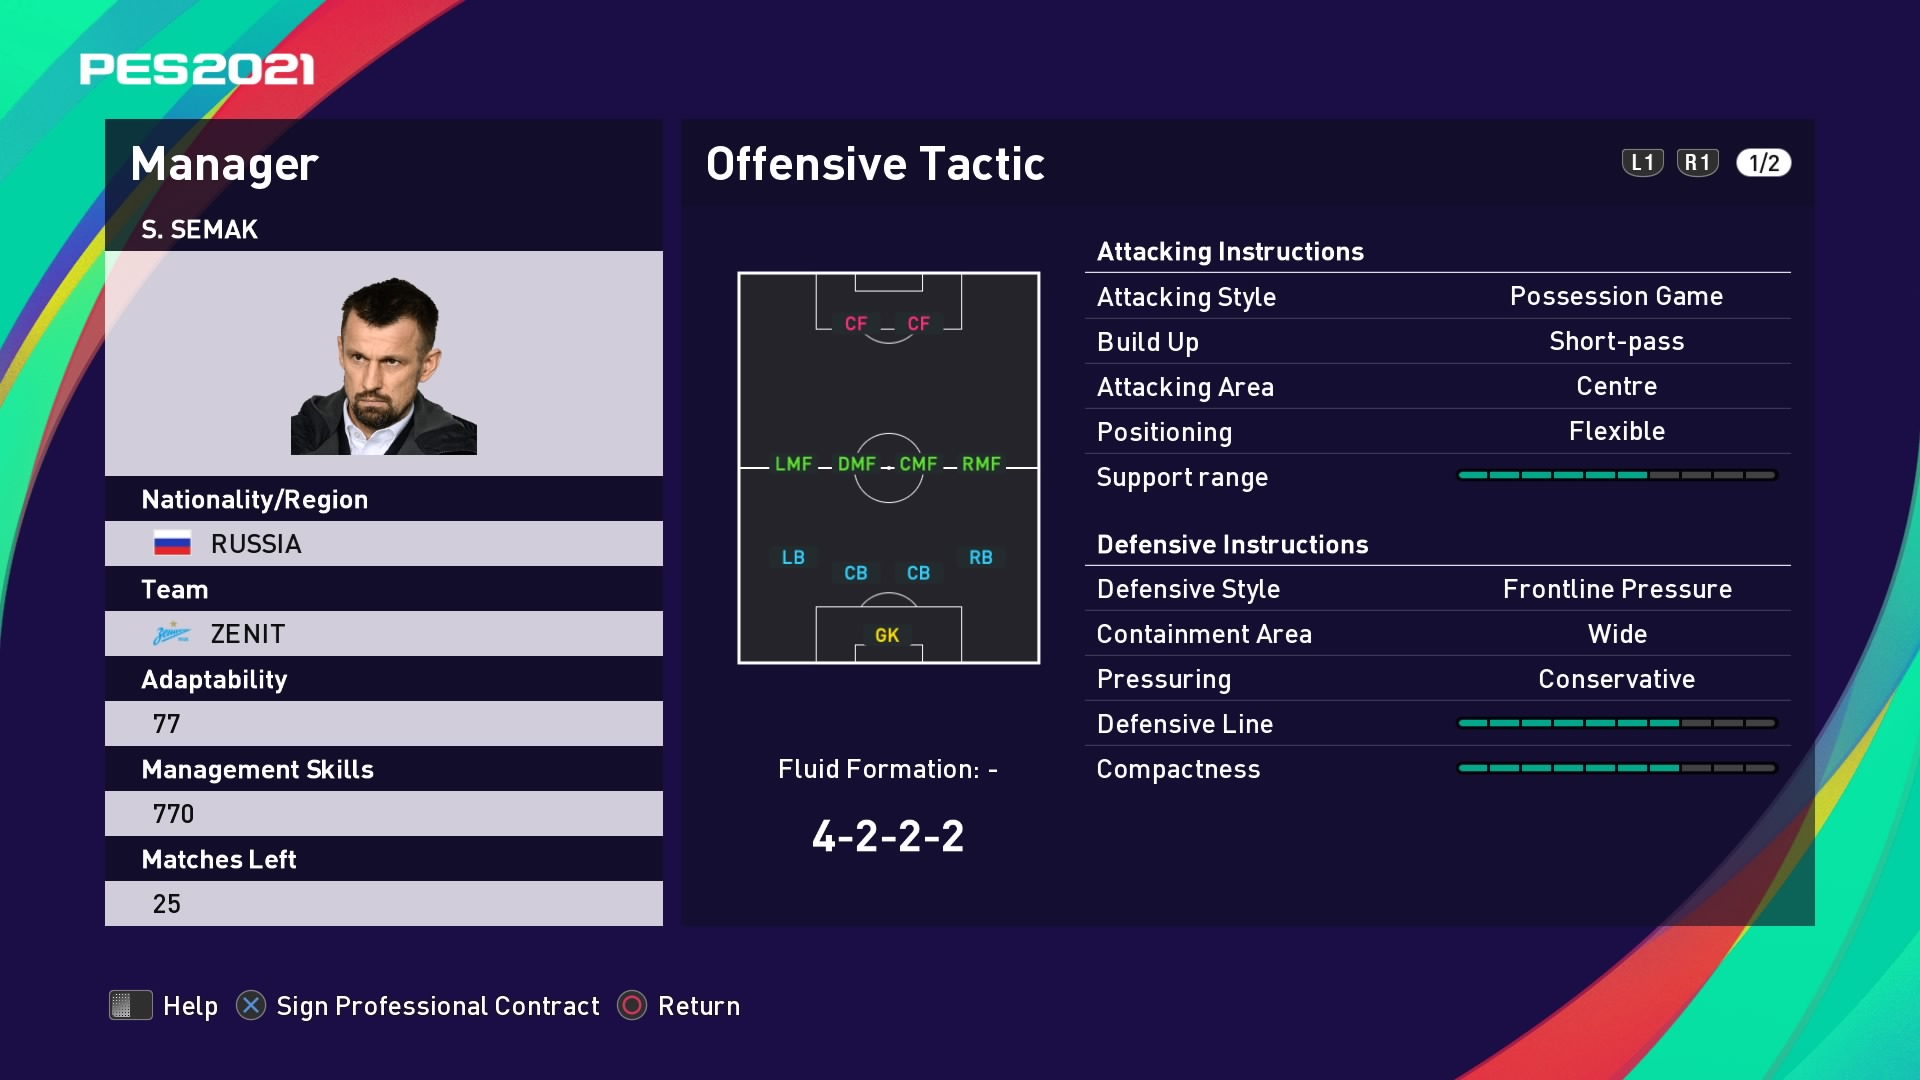 S. Semak (Sergei Semak) Offensive Tactic in PES 2021 myClub